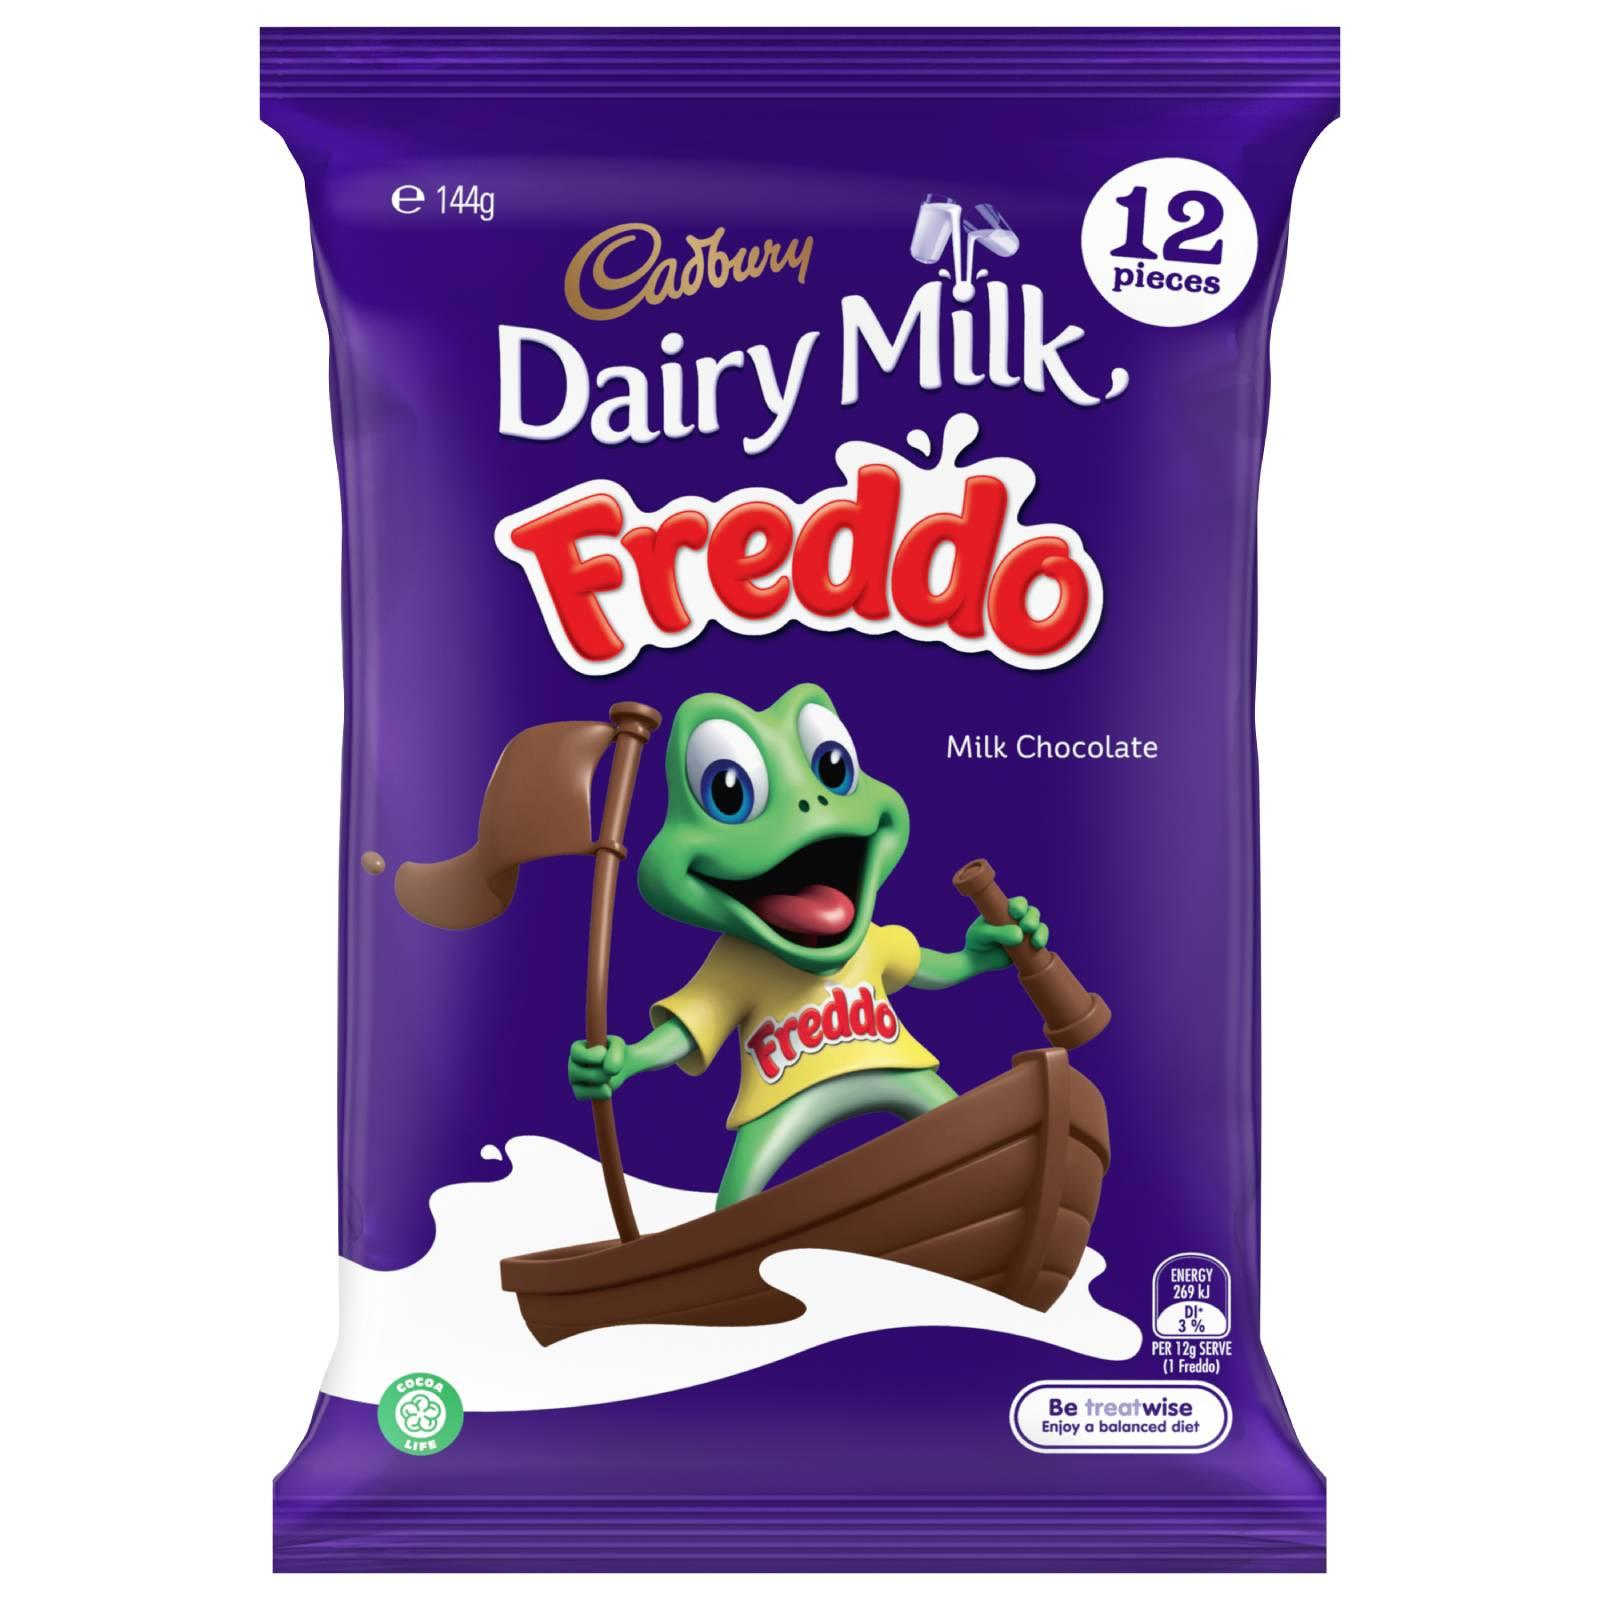 Cadbury Dairy Milk Freddo Milk Chocolate Multipack